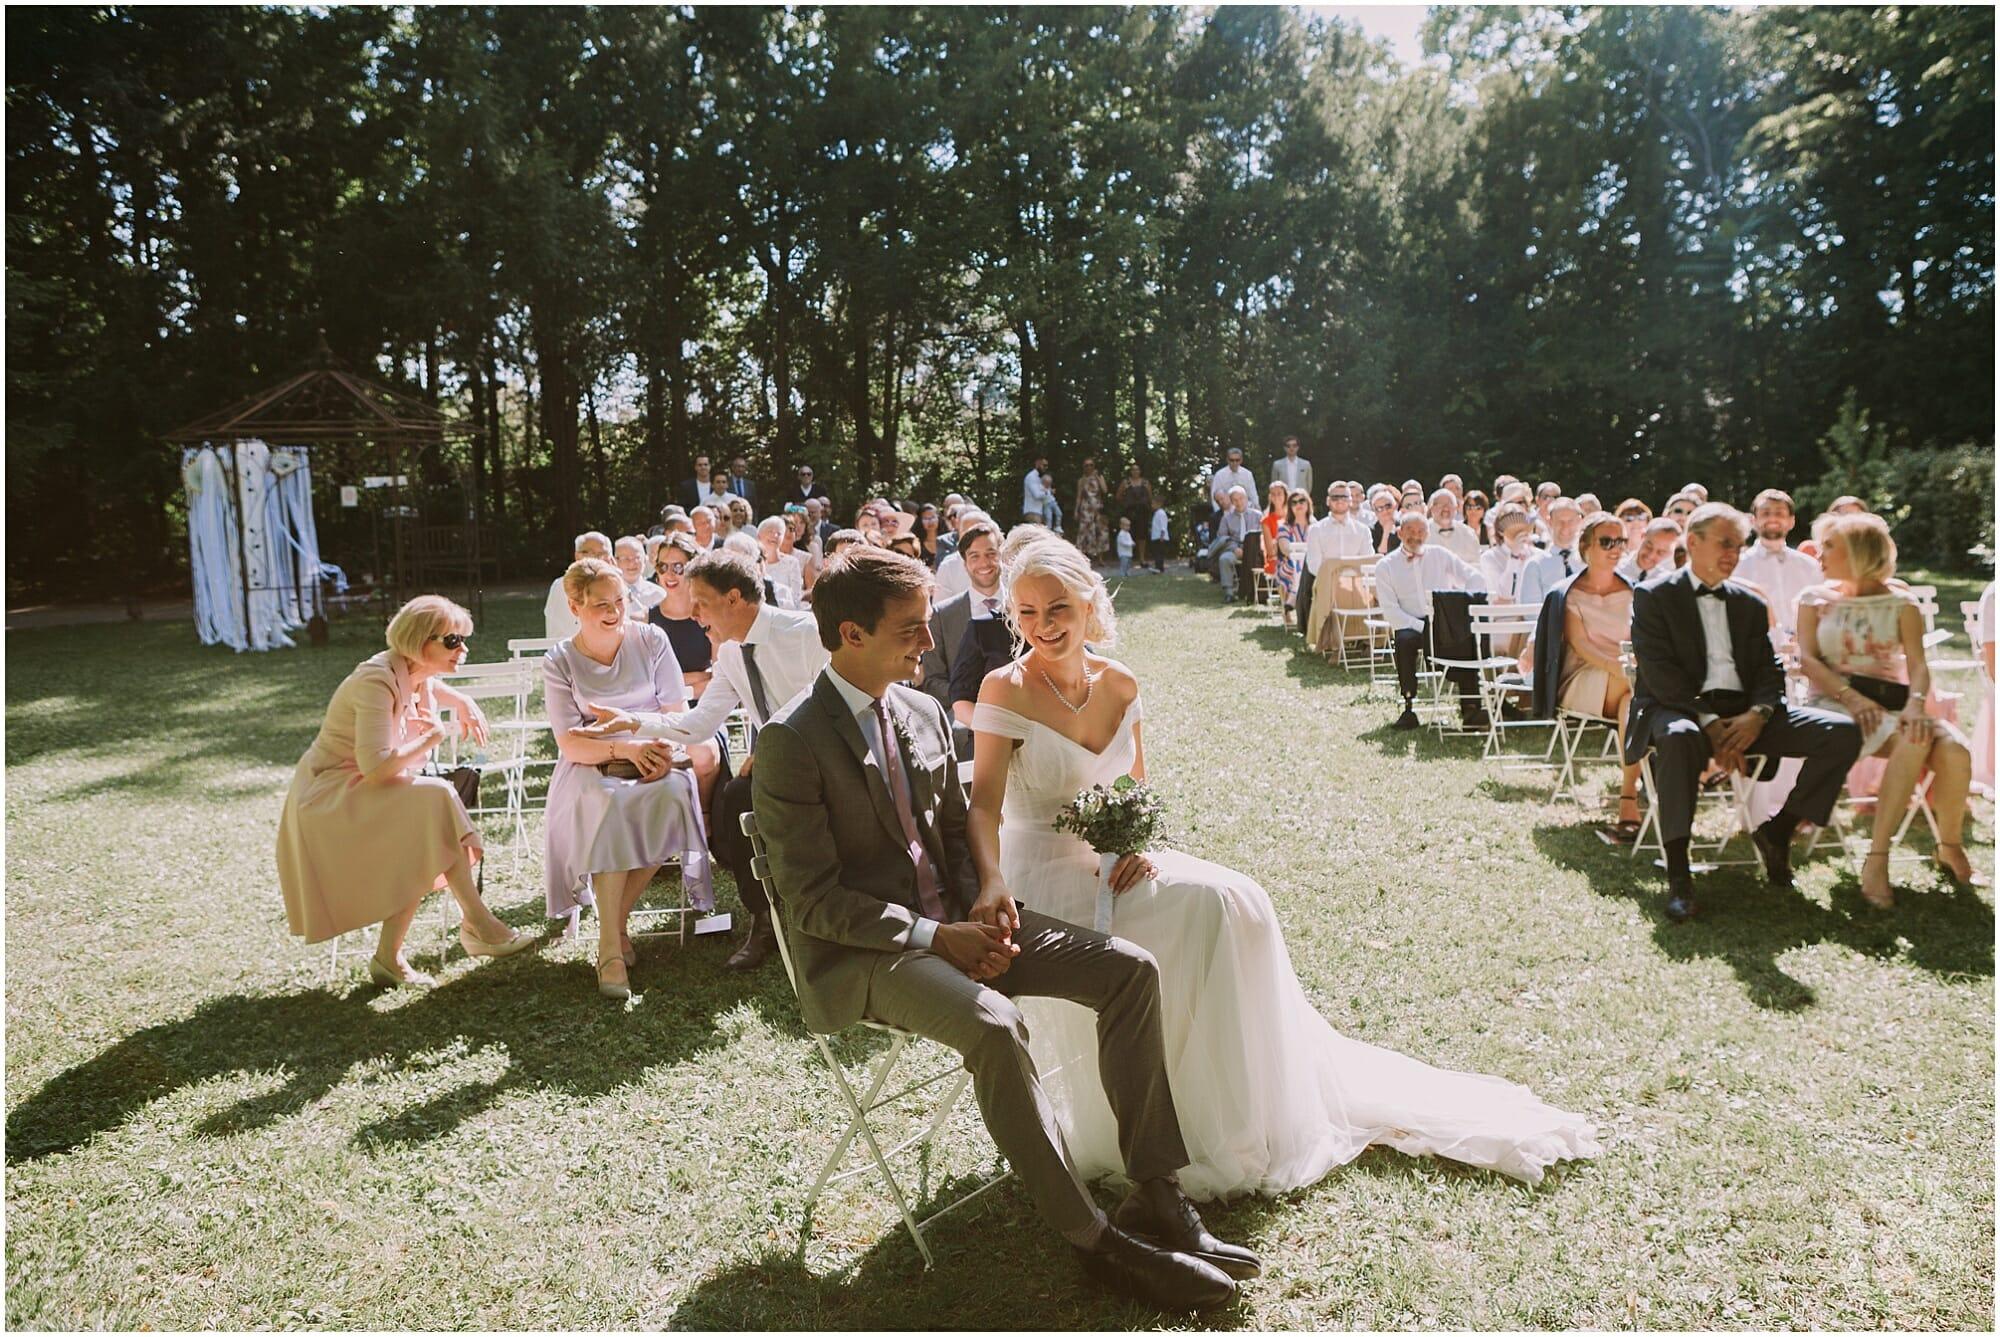 Kateryna-photos-photographe-mariage-chateau-des-3-fontaines-provence-avignon-vaucluse-sud_0042.jpg